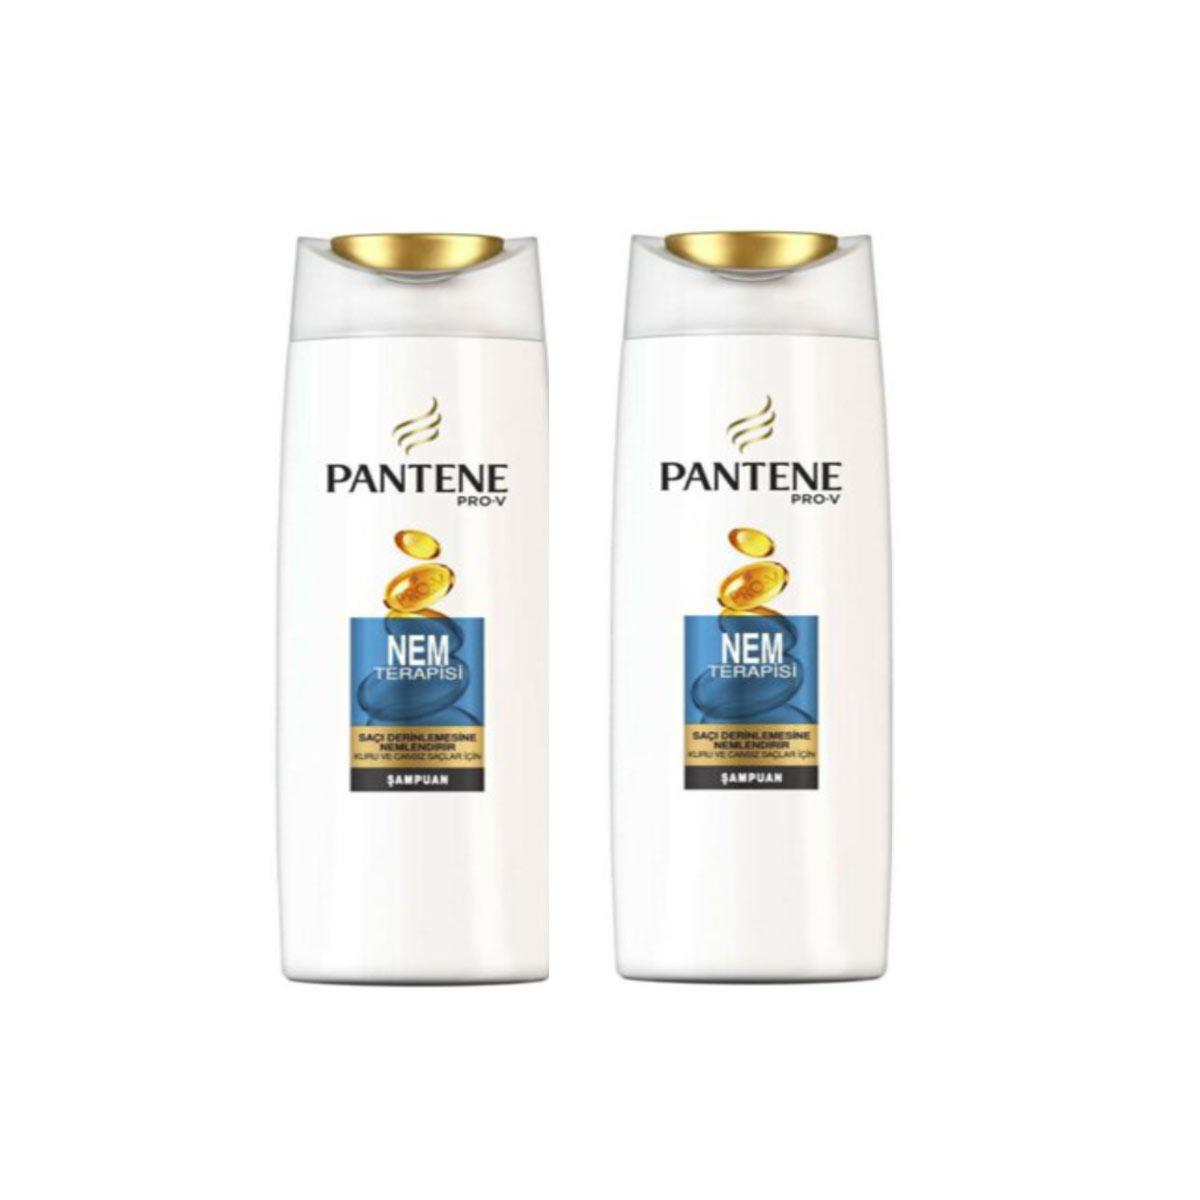 Pantene Şampuan Nem Terapisi 500 Ml X 2 Adet